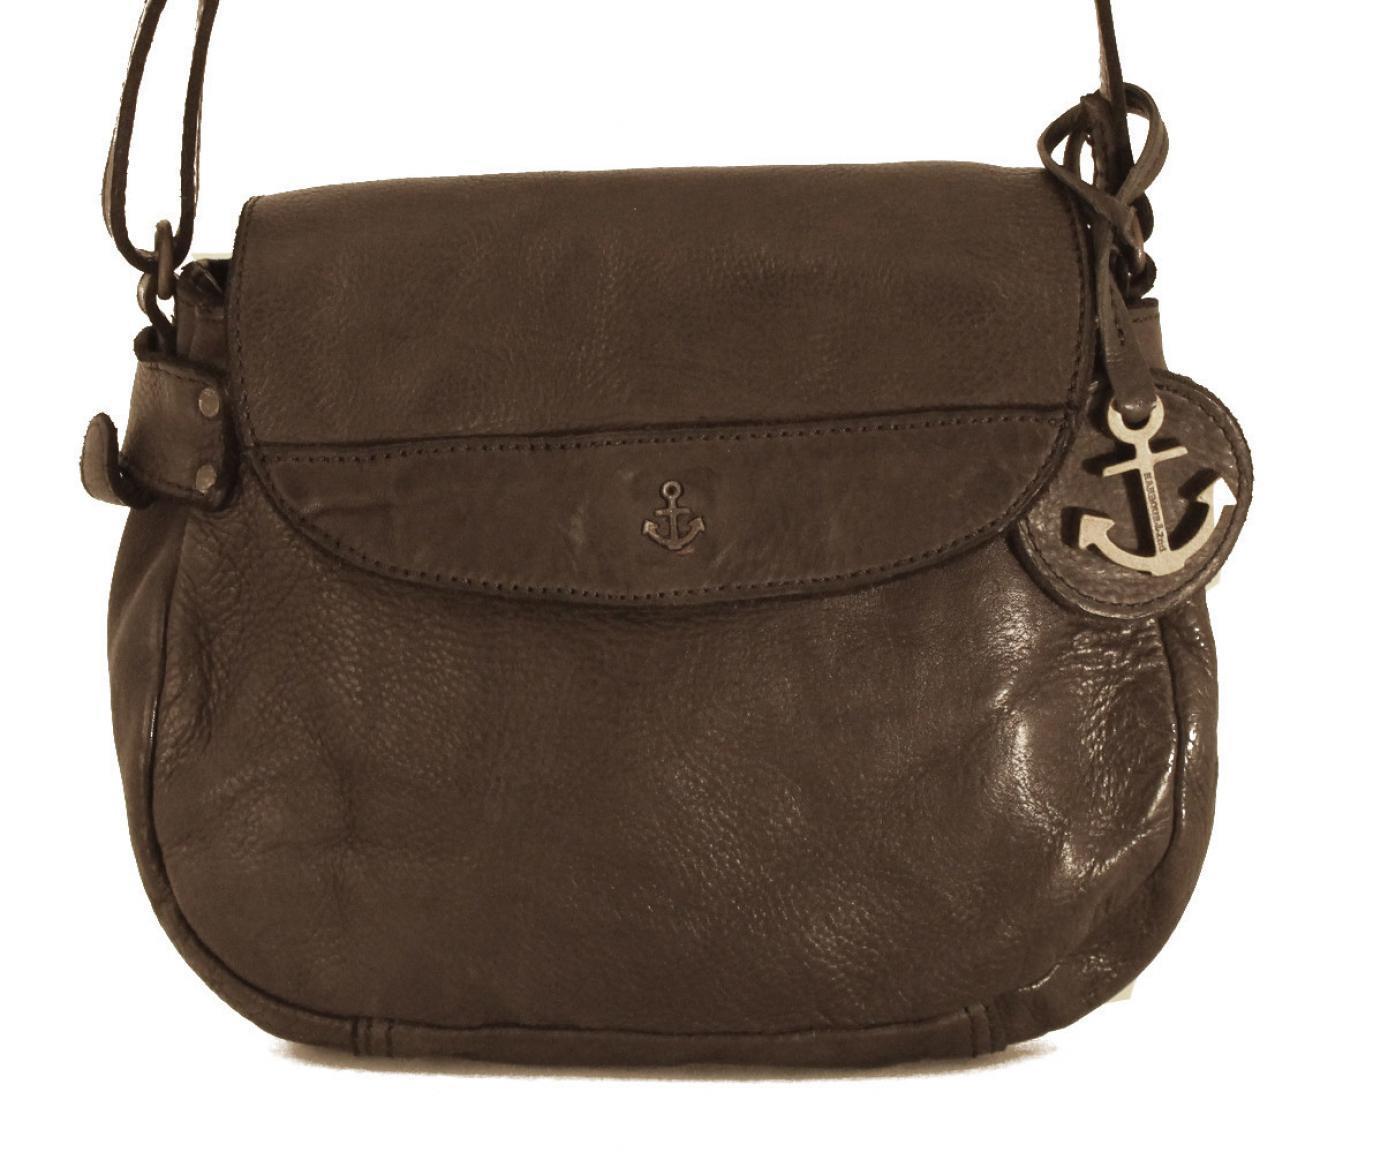 Harbour2nd Überschlagtasche Chloe Bronze metallic Leder